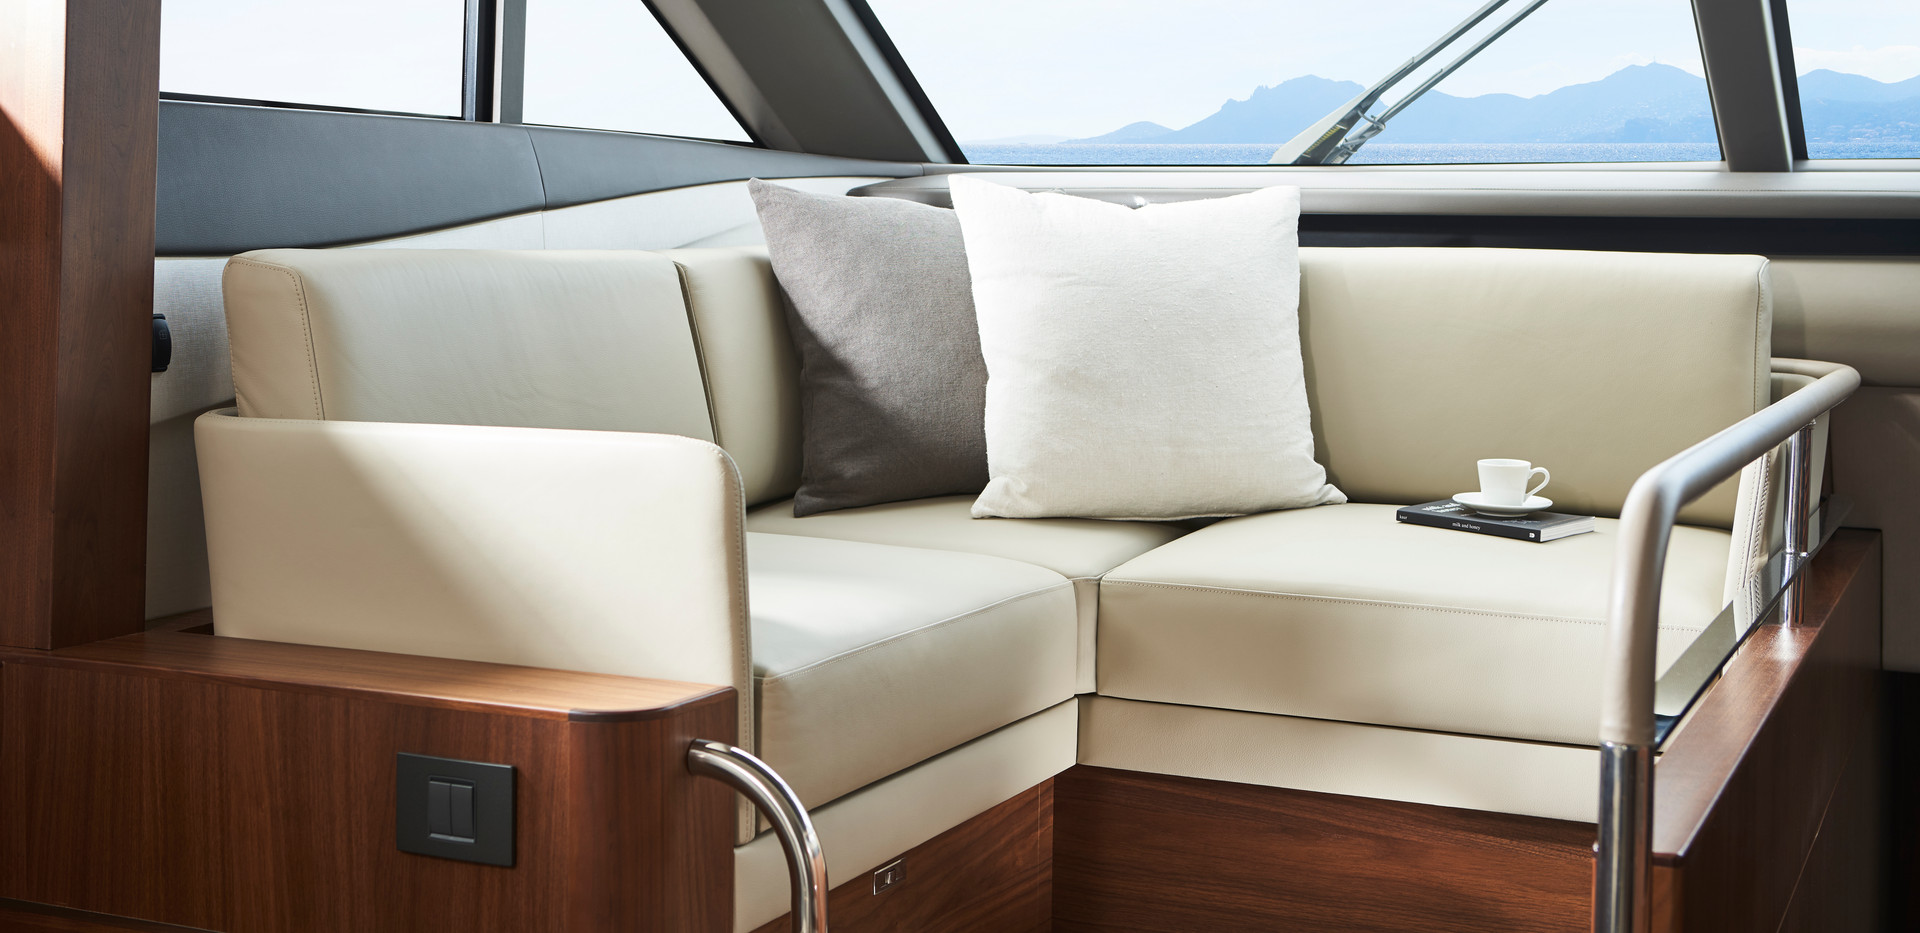 y78-interior-helm-companion-seating-waln